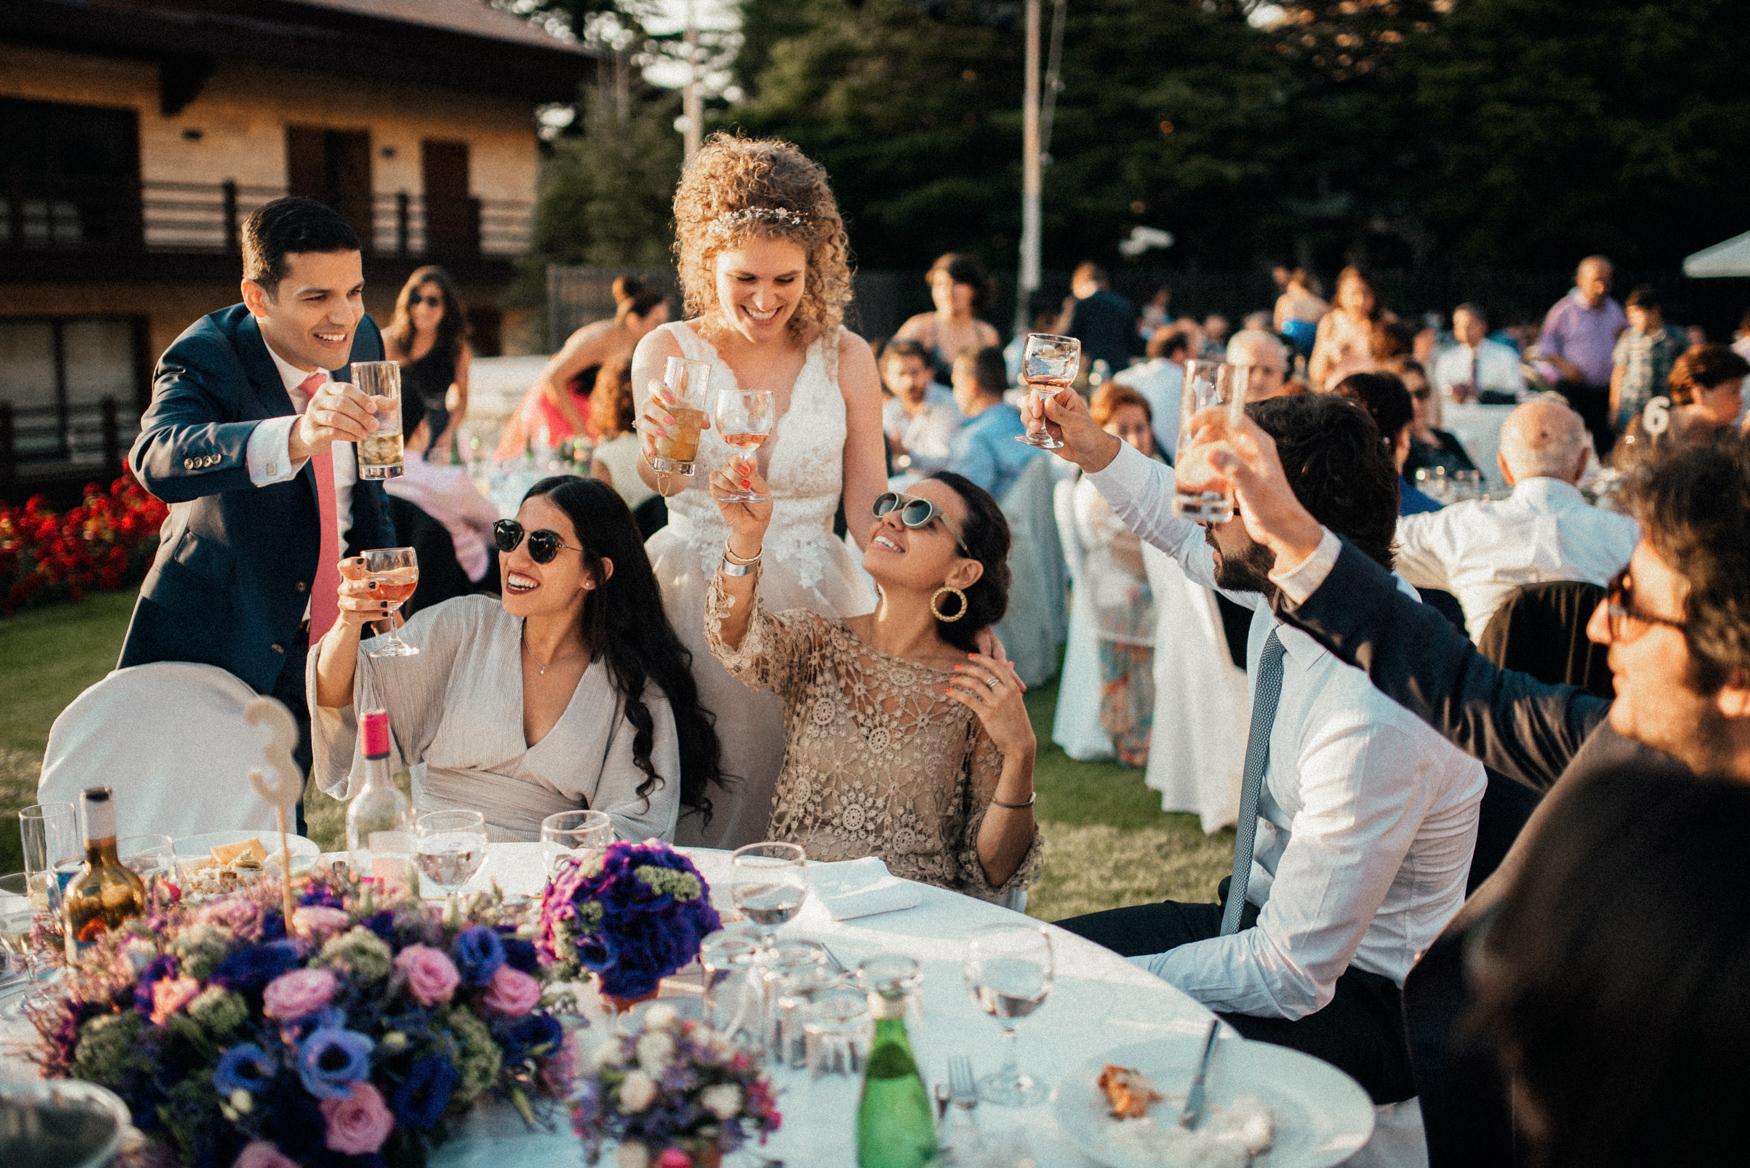 LR5 beirut lebanon mzaar intercontinental wedding photographer 013.jpg